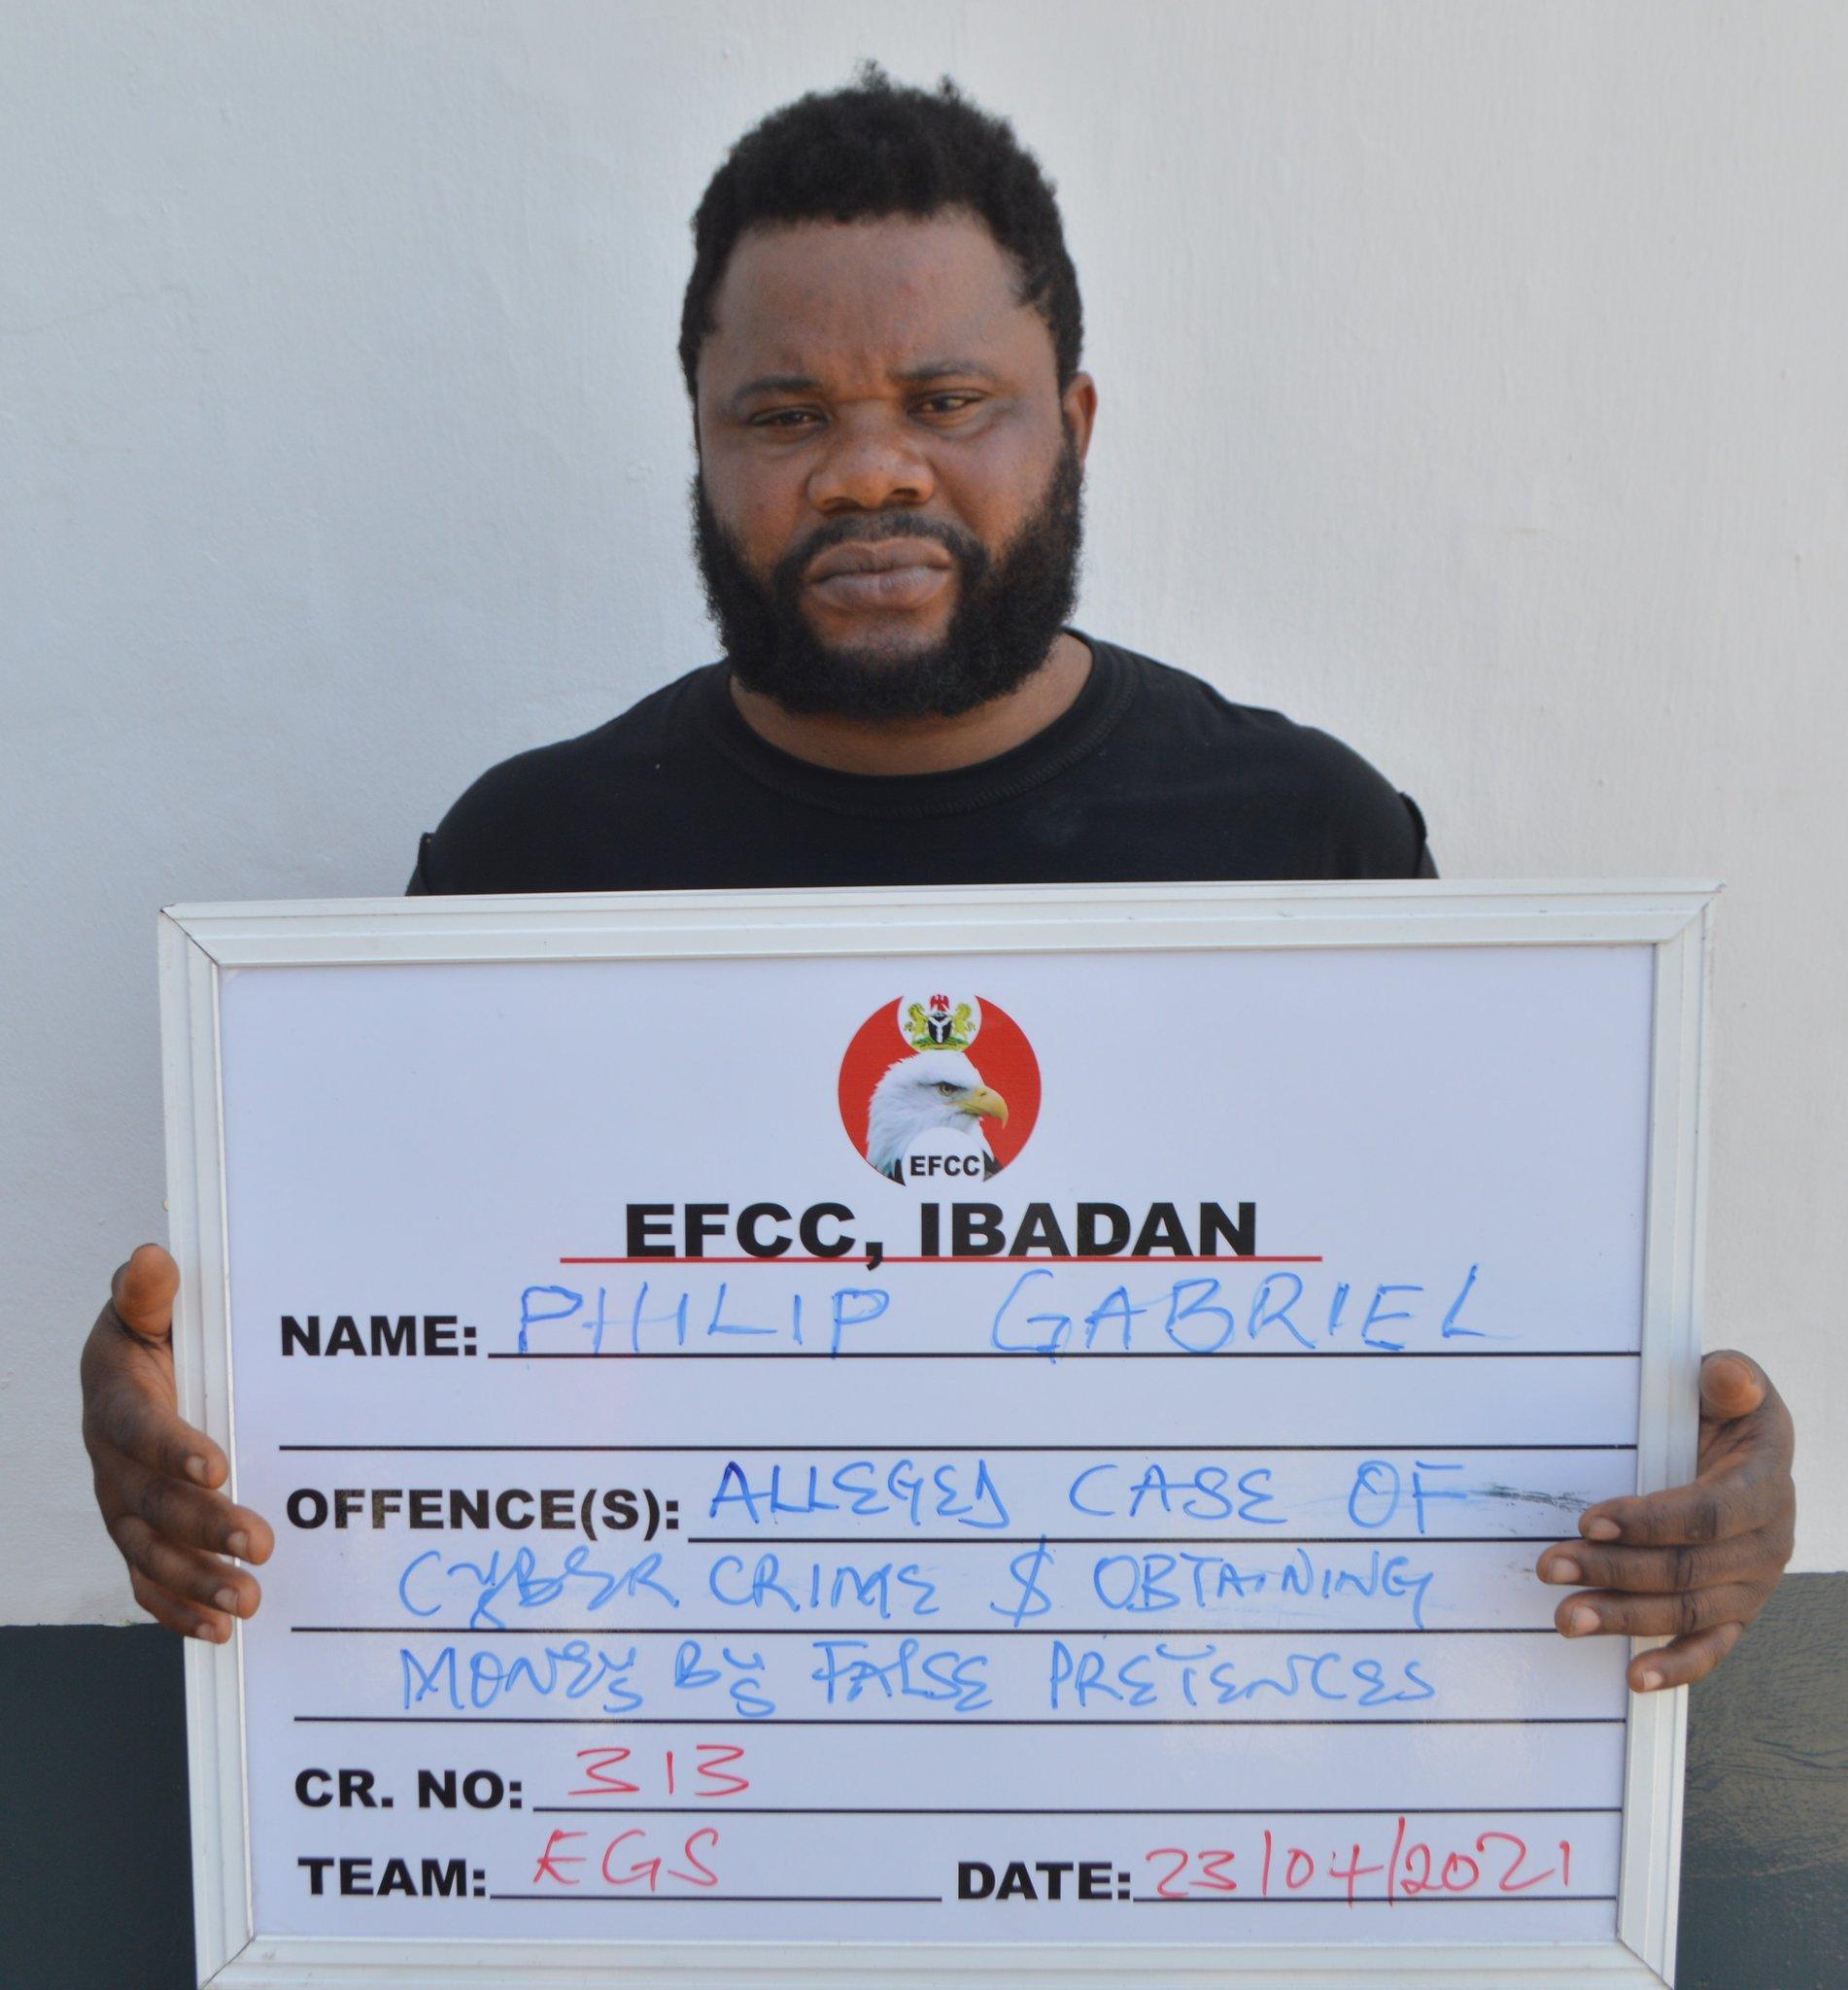 EFCC Arrest Bitcoin Vendor [PHOTO CREDIT: @officialEFCC]